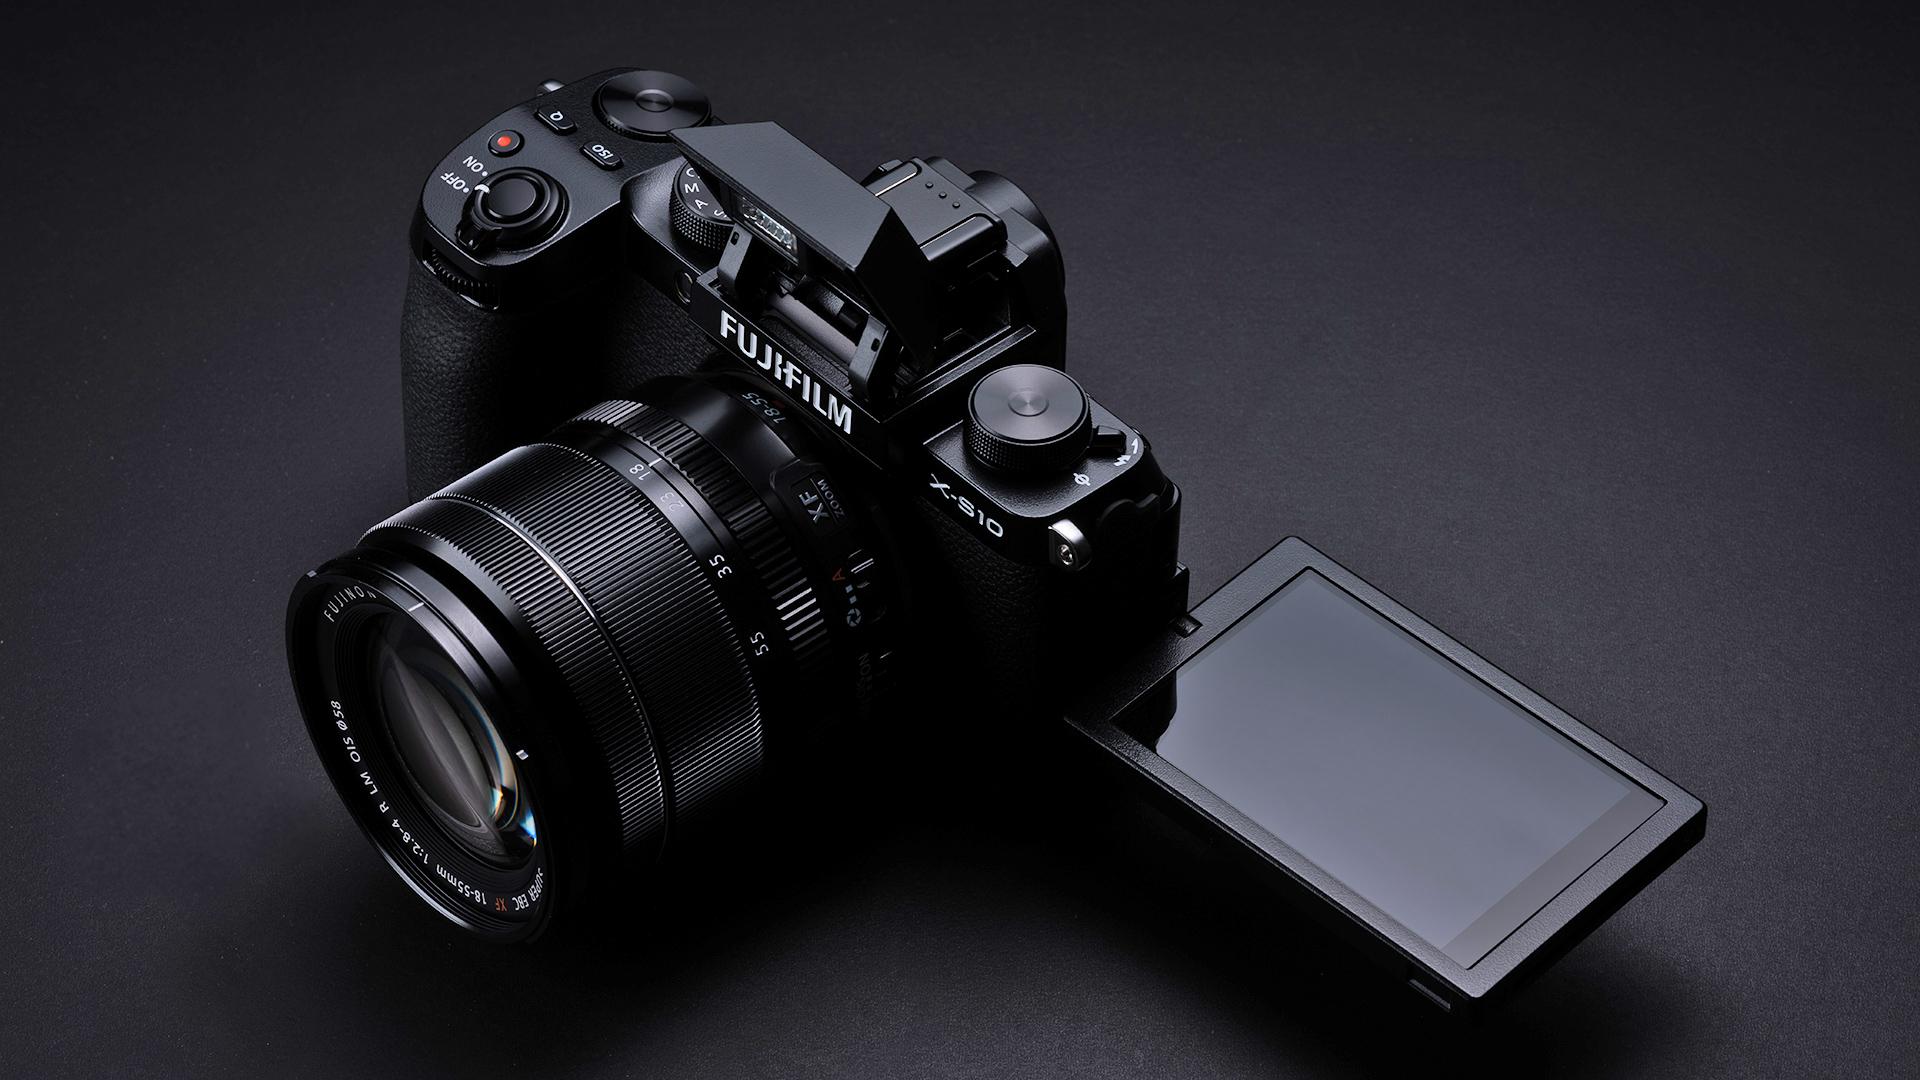 FUJIFILM's new X-S10 mirrorless camera. Image: FUJIFILM.